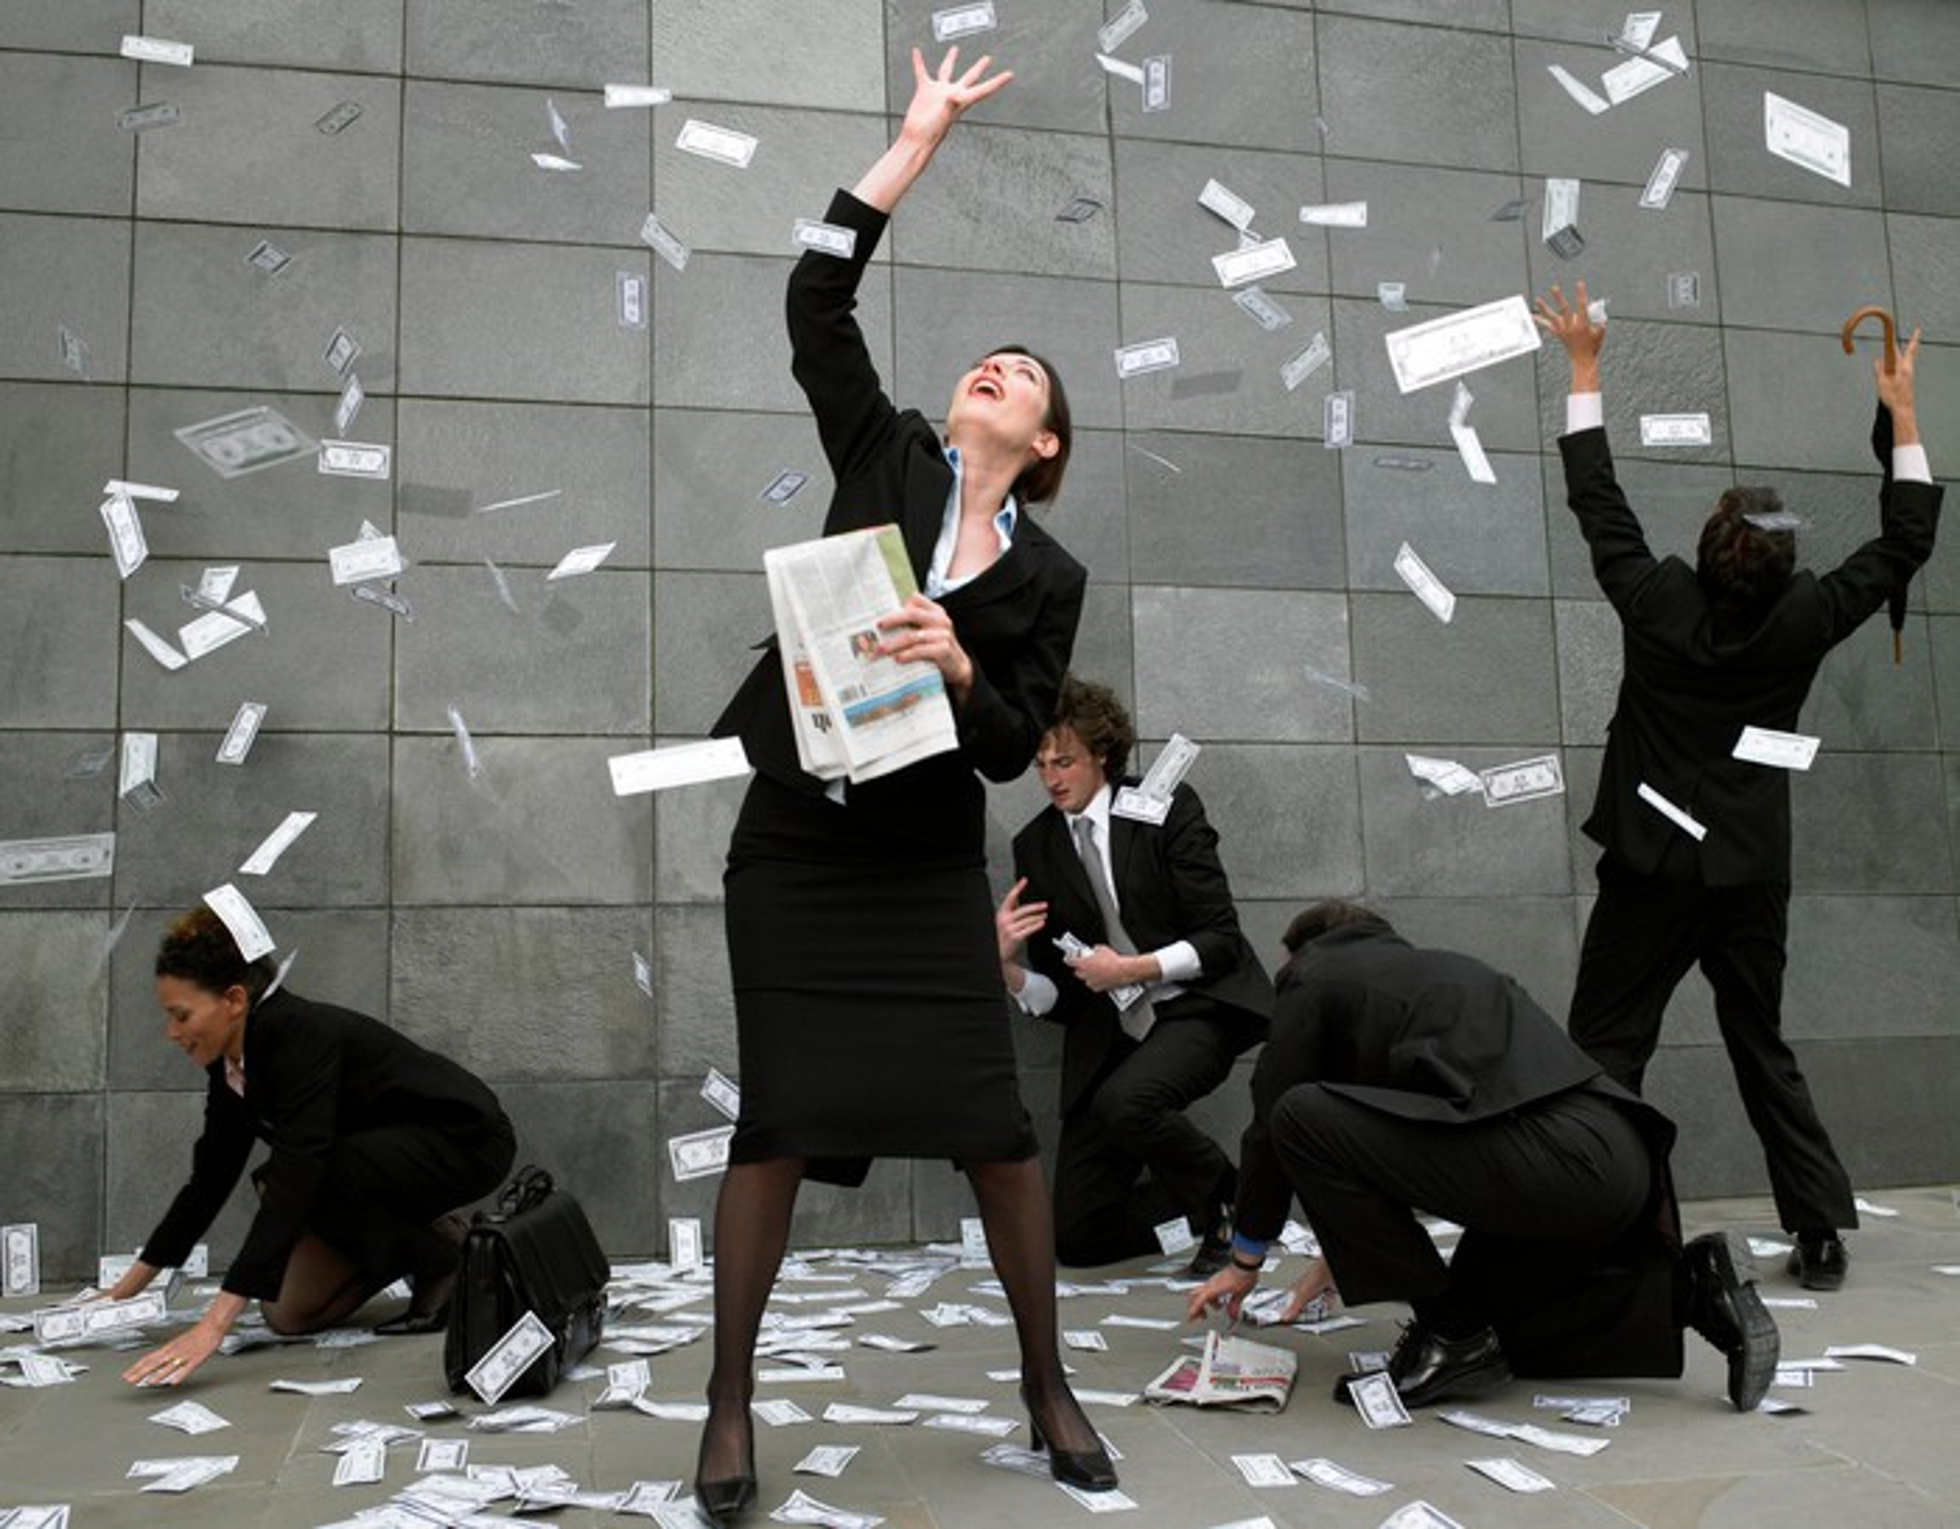 Money raining on people